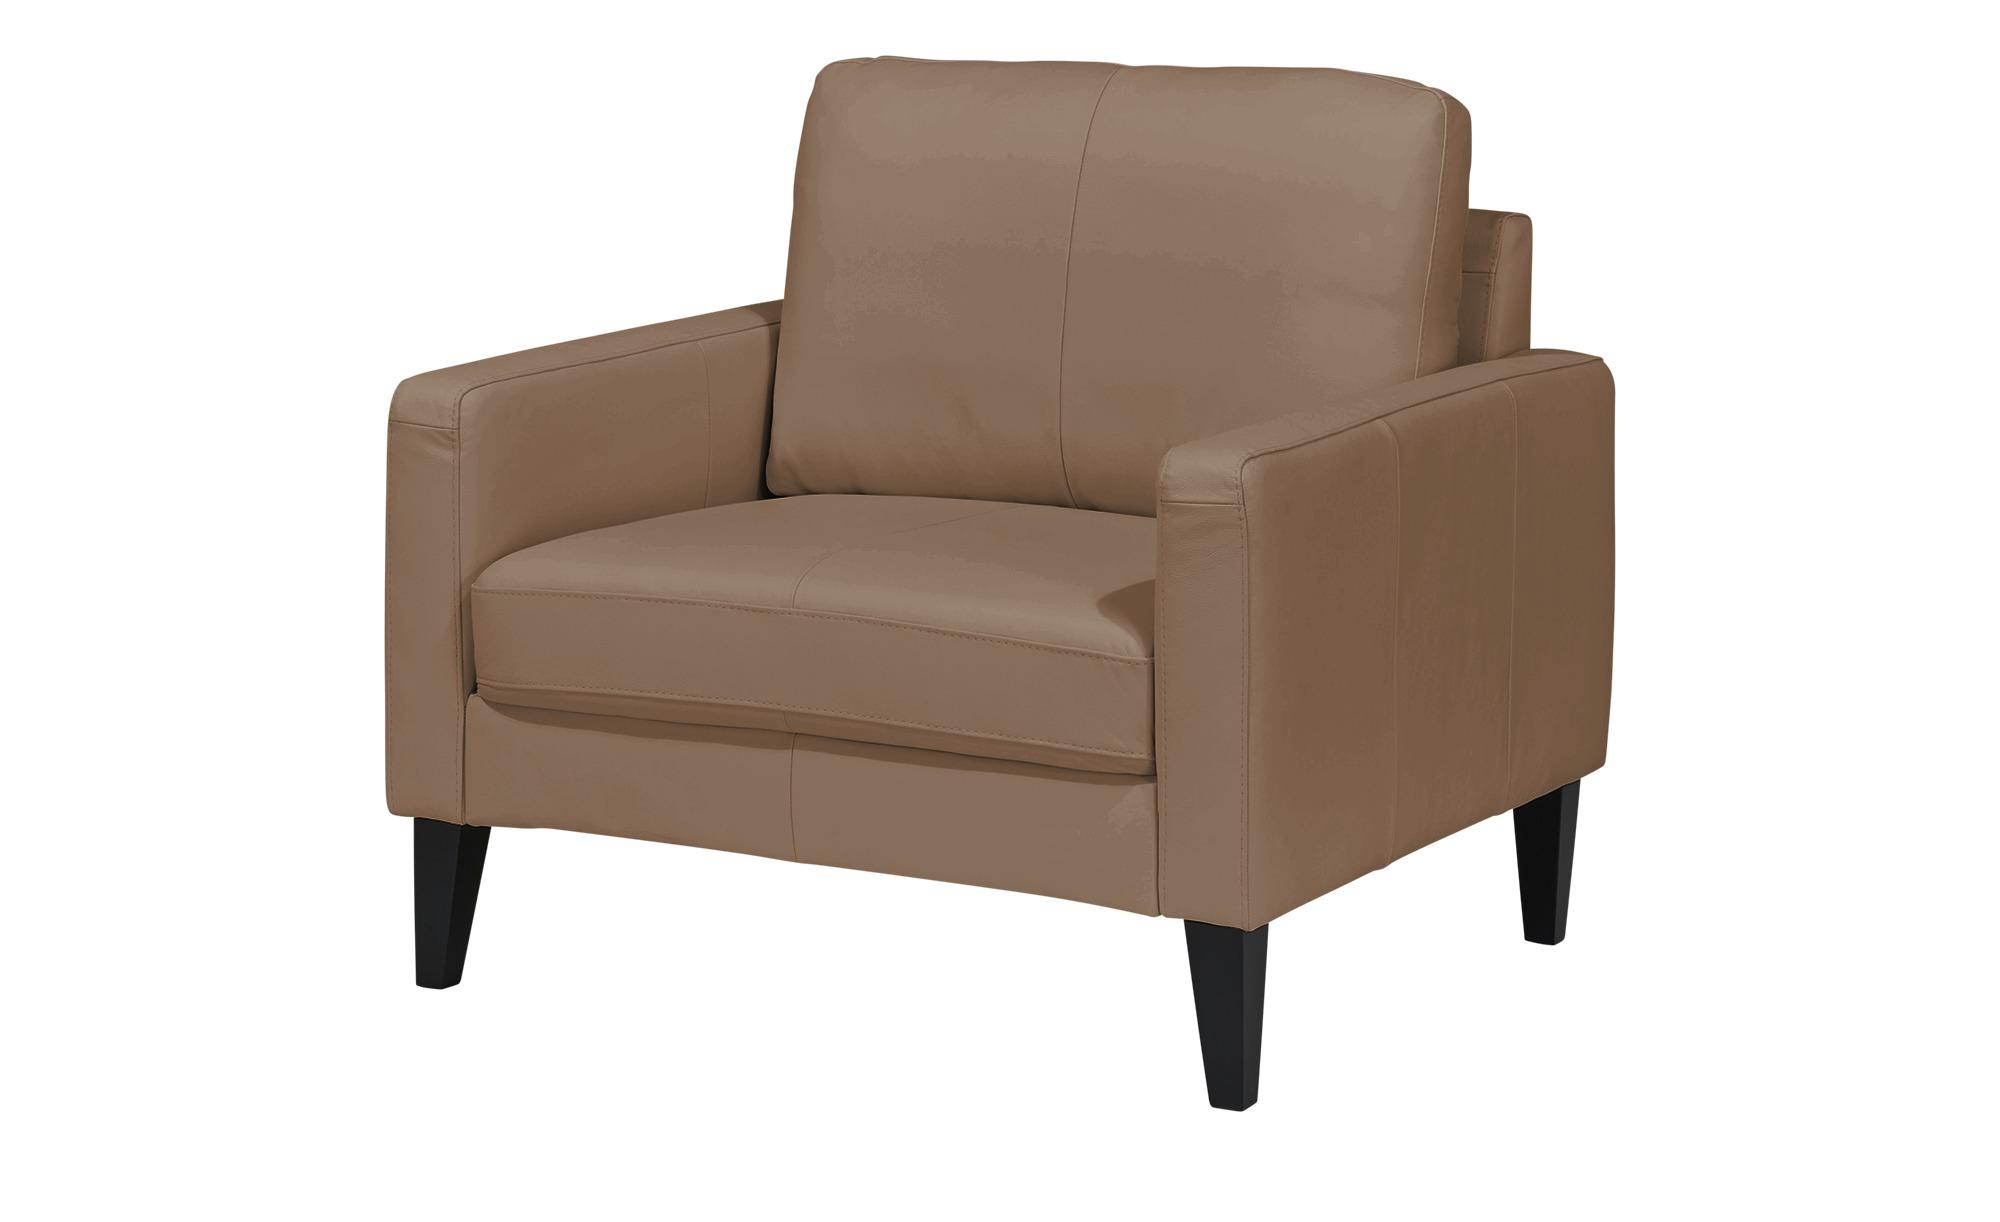 Sessel  Oralia ¦ braun ¦ Maße (cm): B: 100 H: 90 T: 93 Polstermöbel > Sessel > Ledersessel - Höffner